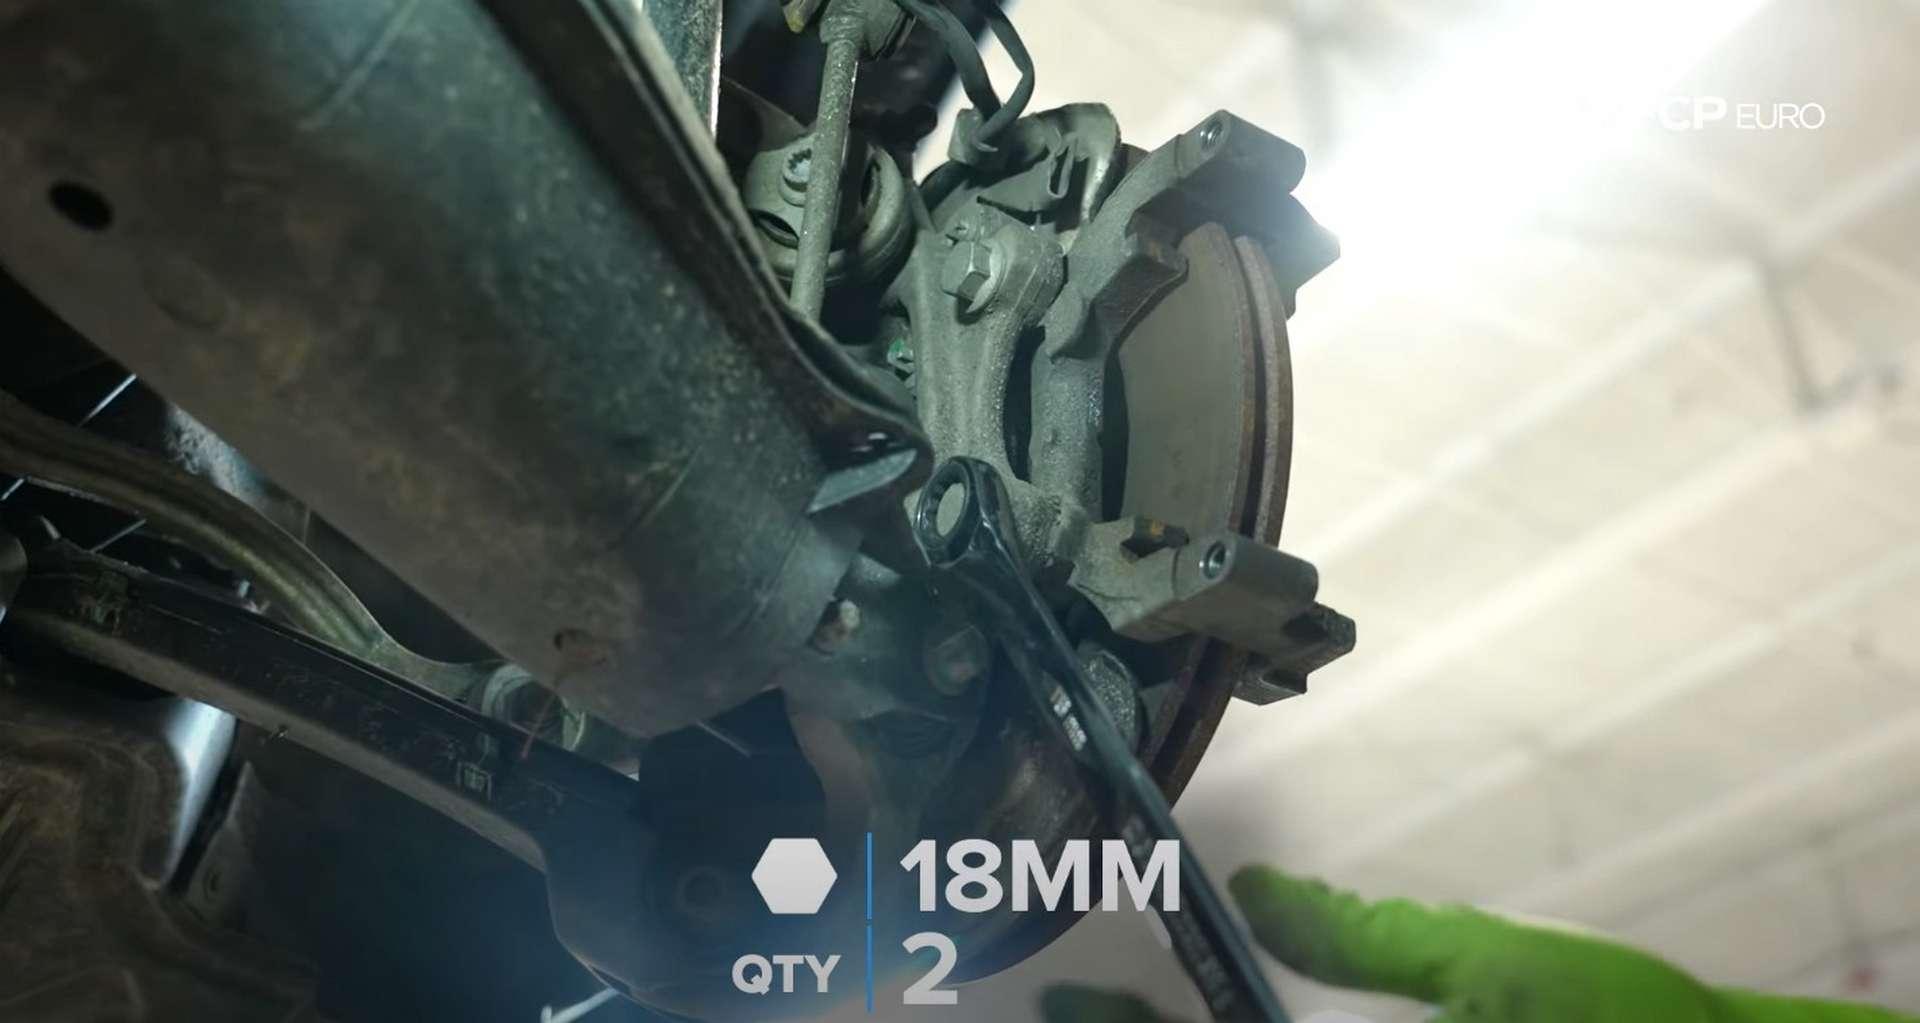 DIY Mercedes W205 Rear Brake Service removing the caliper bracket